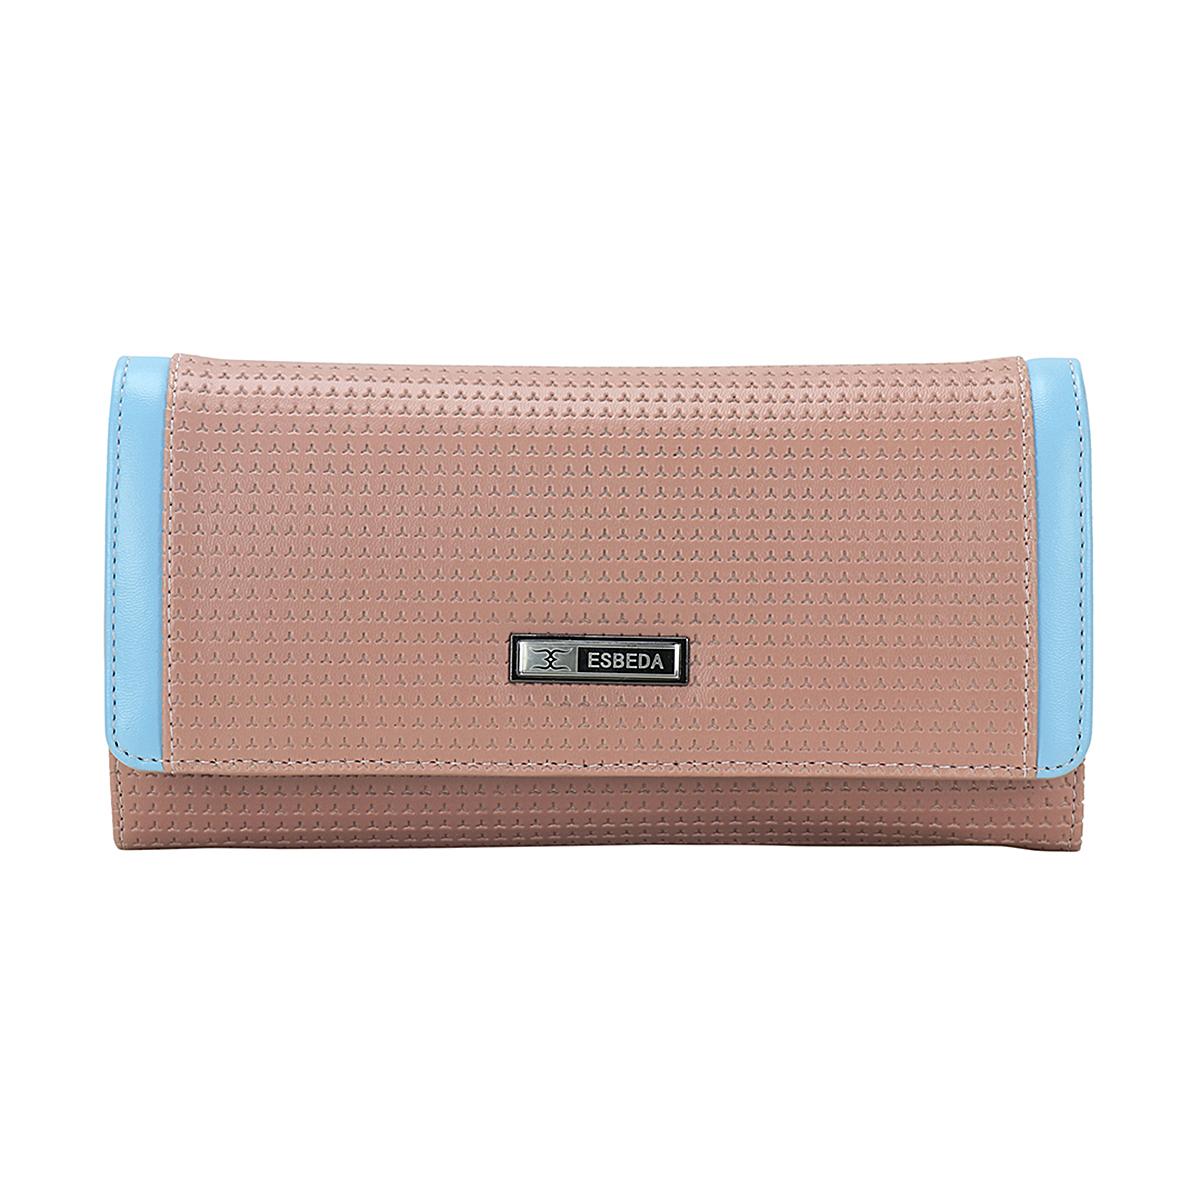 ESBEDA | ESBEDA Peach Color Emboss Texture Wallet For Women